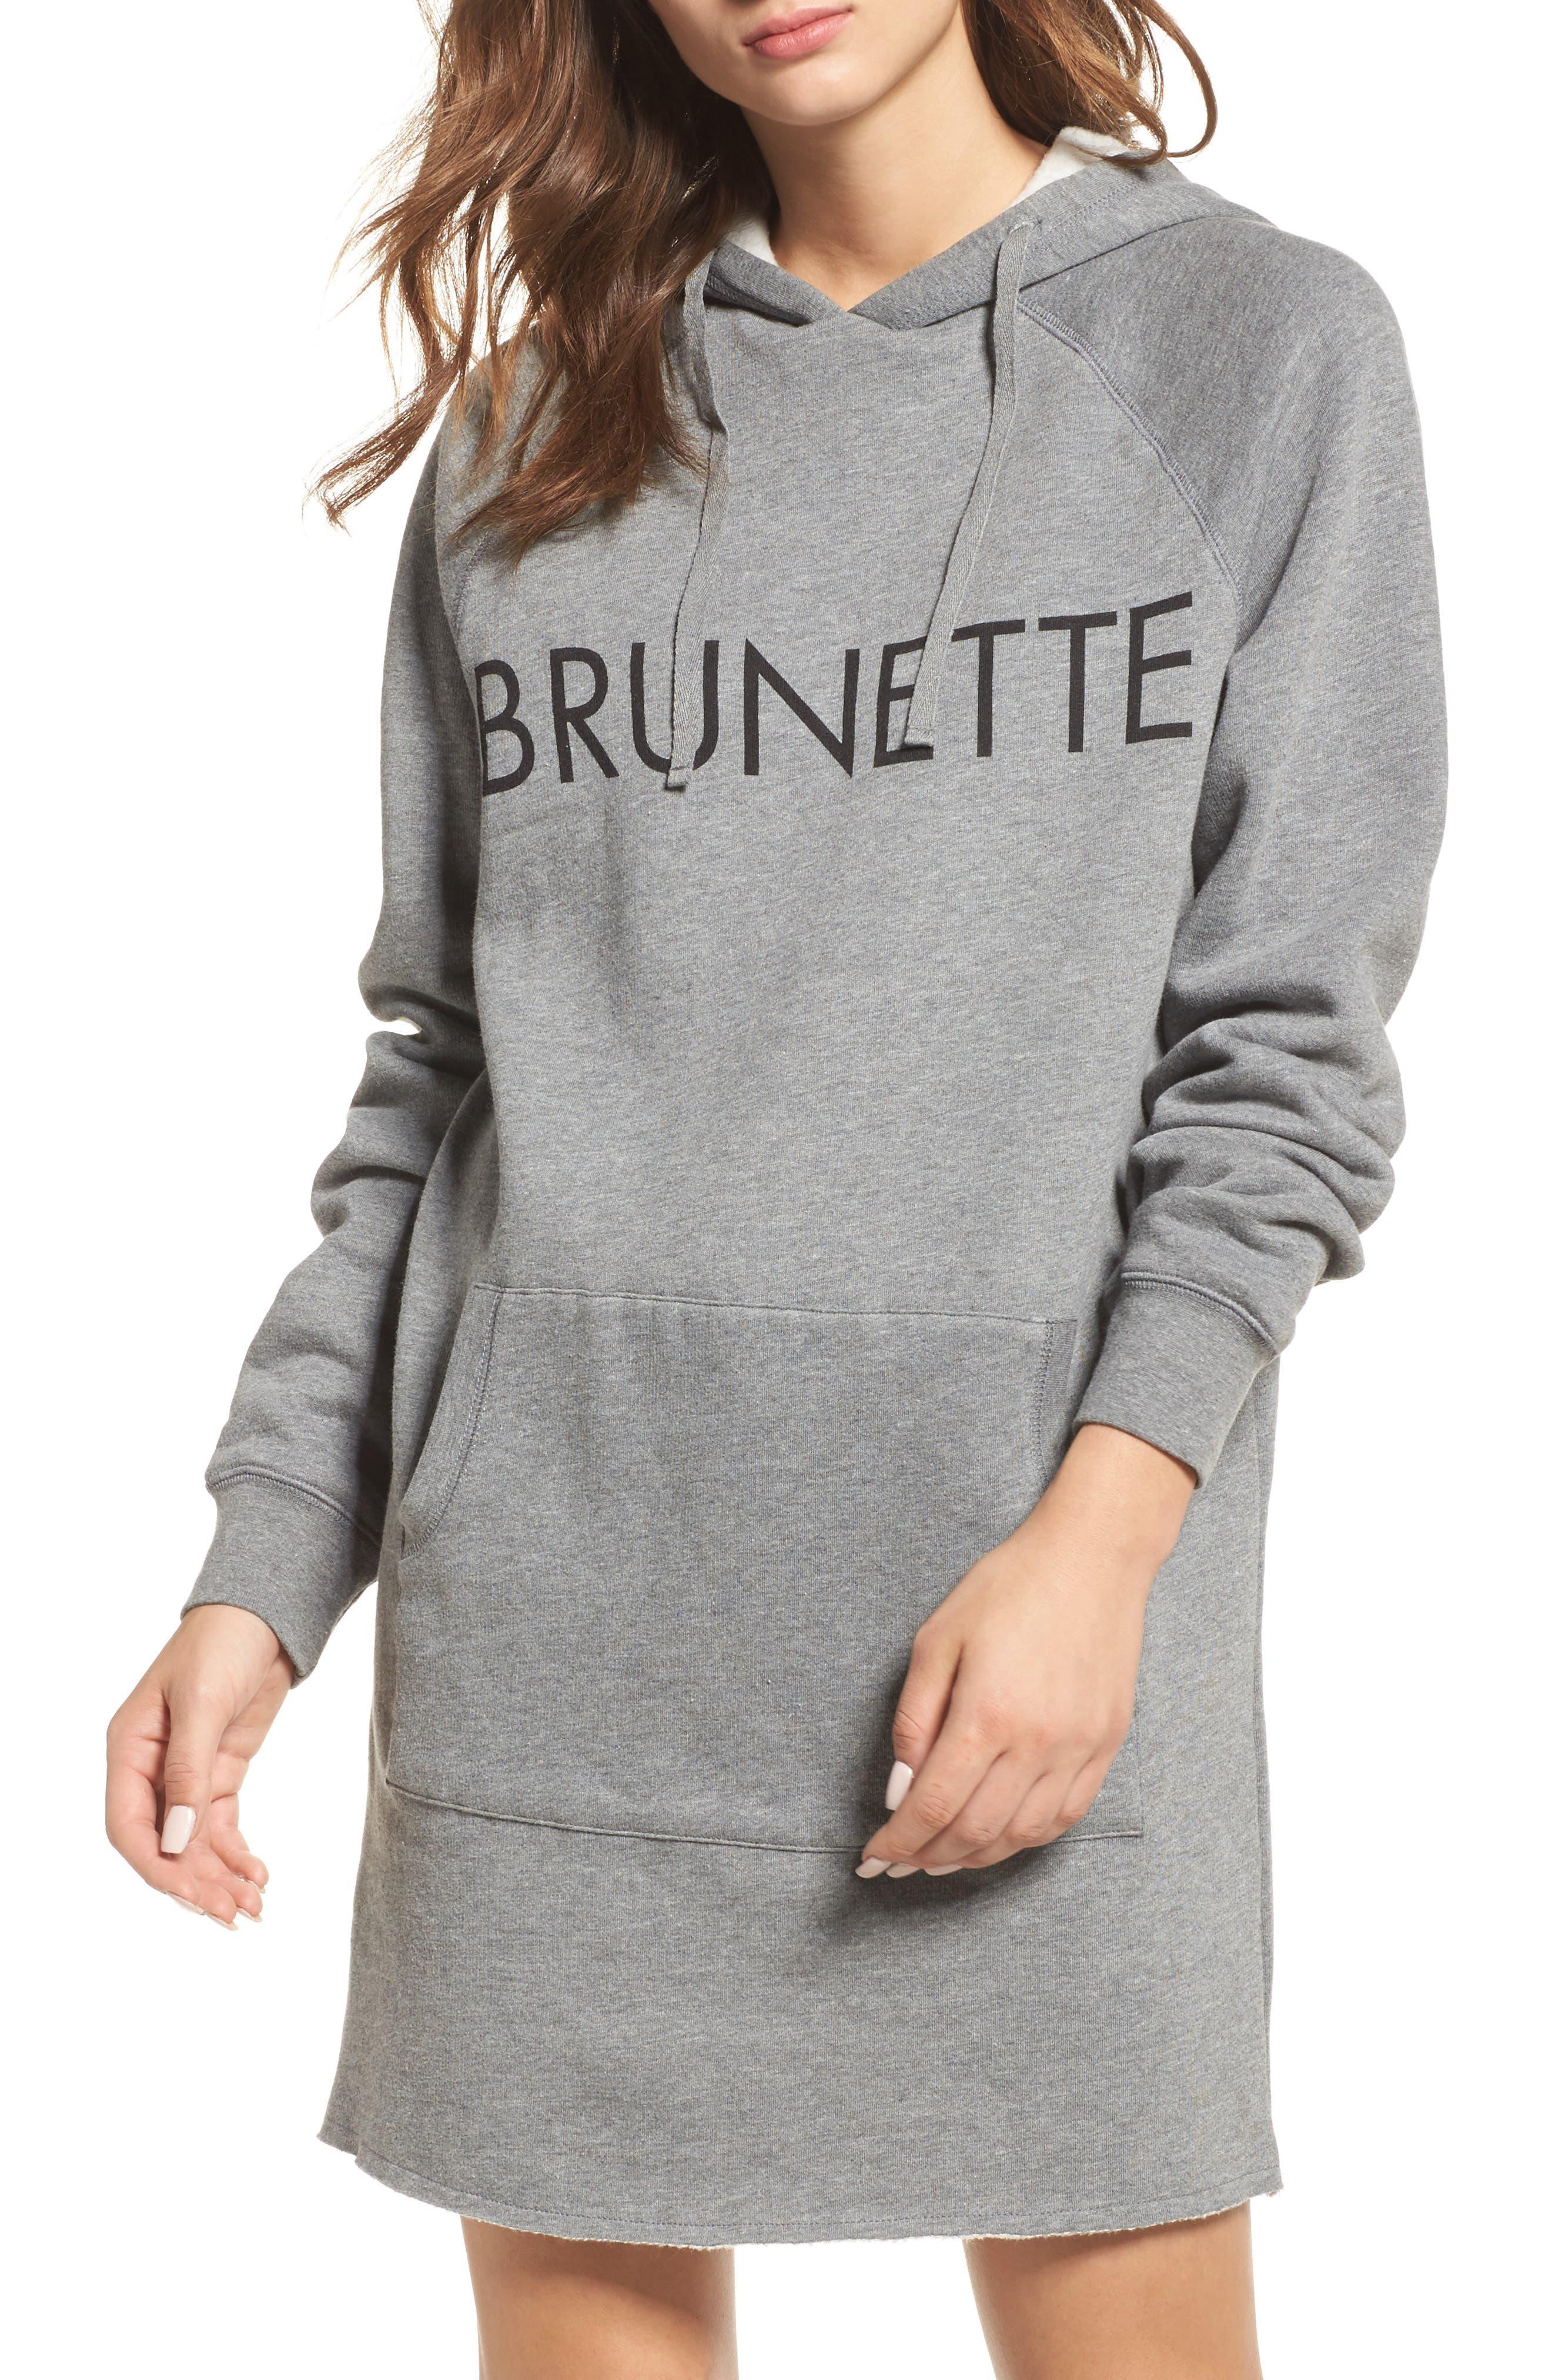 Brunette Sweatshirt Dress,                             Main thumbnail 1, color,                             020